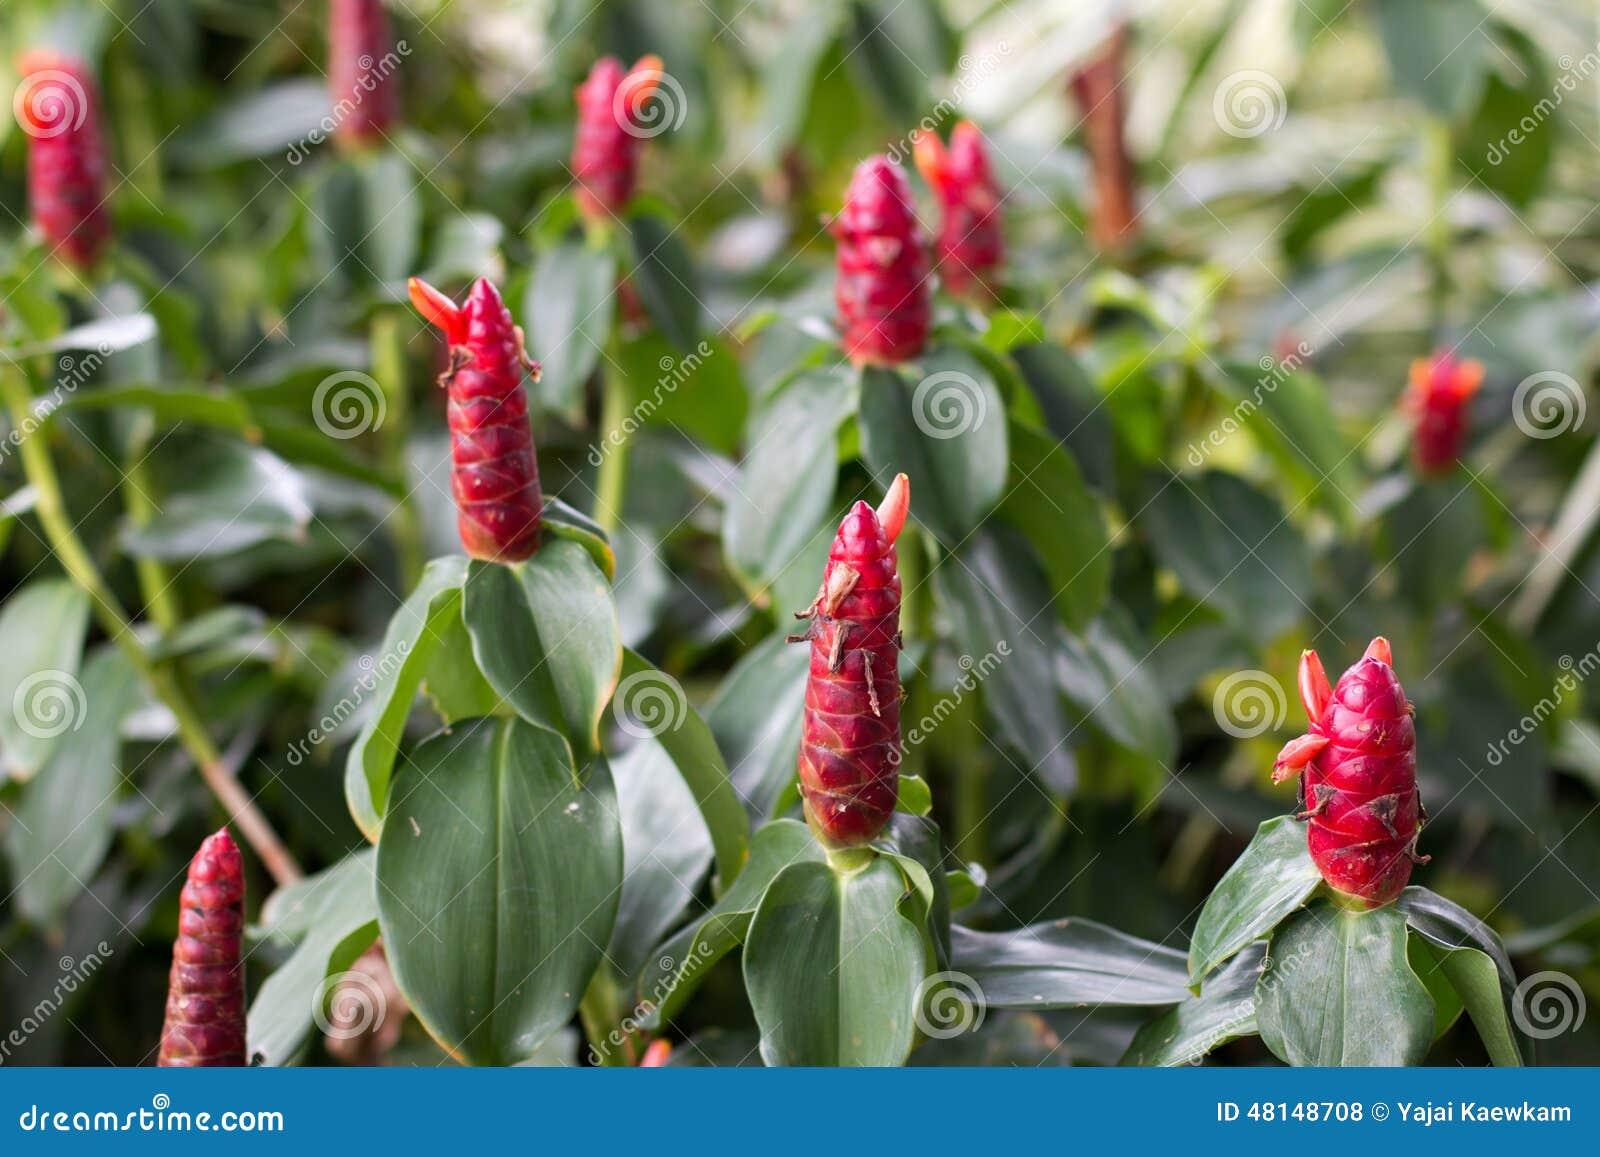 arbuste rouge de fleur photo stock image 48148708. Black Bedroom Furniture Sets. Home Design Ideas